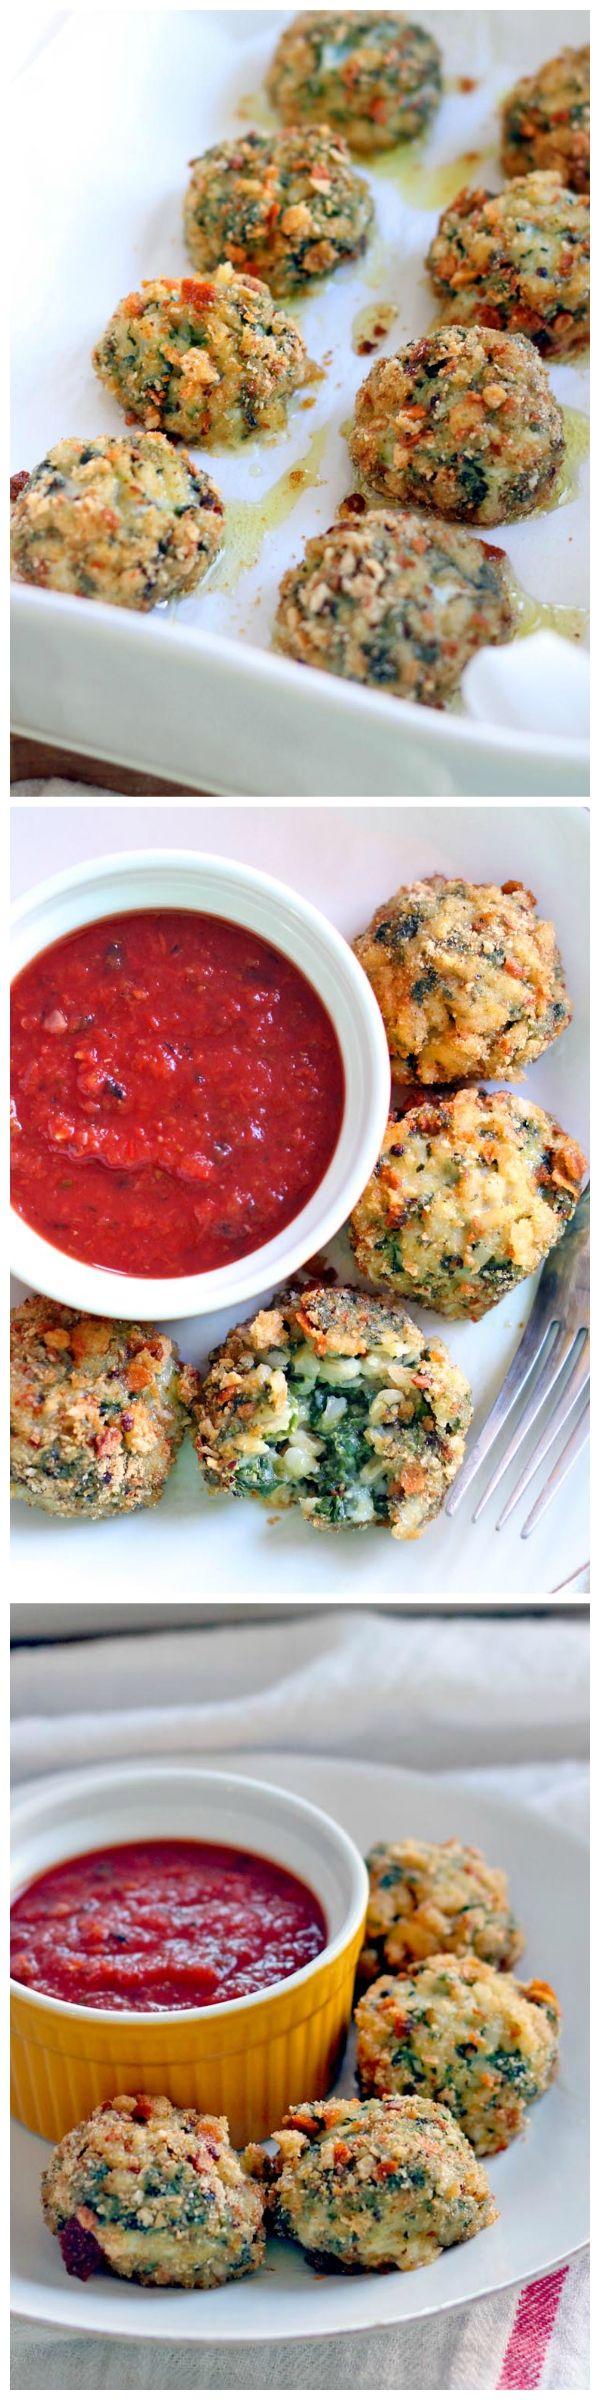 Oven-Baked Spinach and Barley Arancini (Italian Rice Balls)